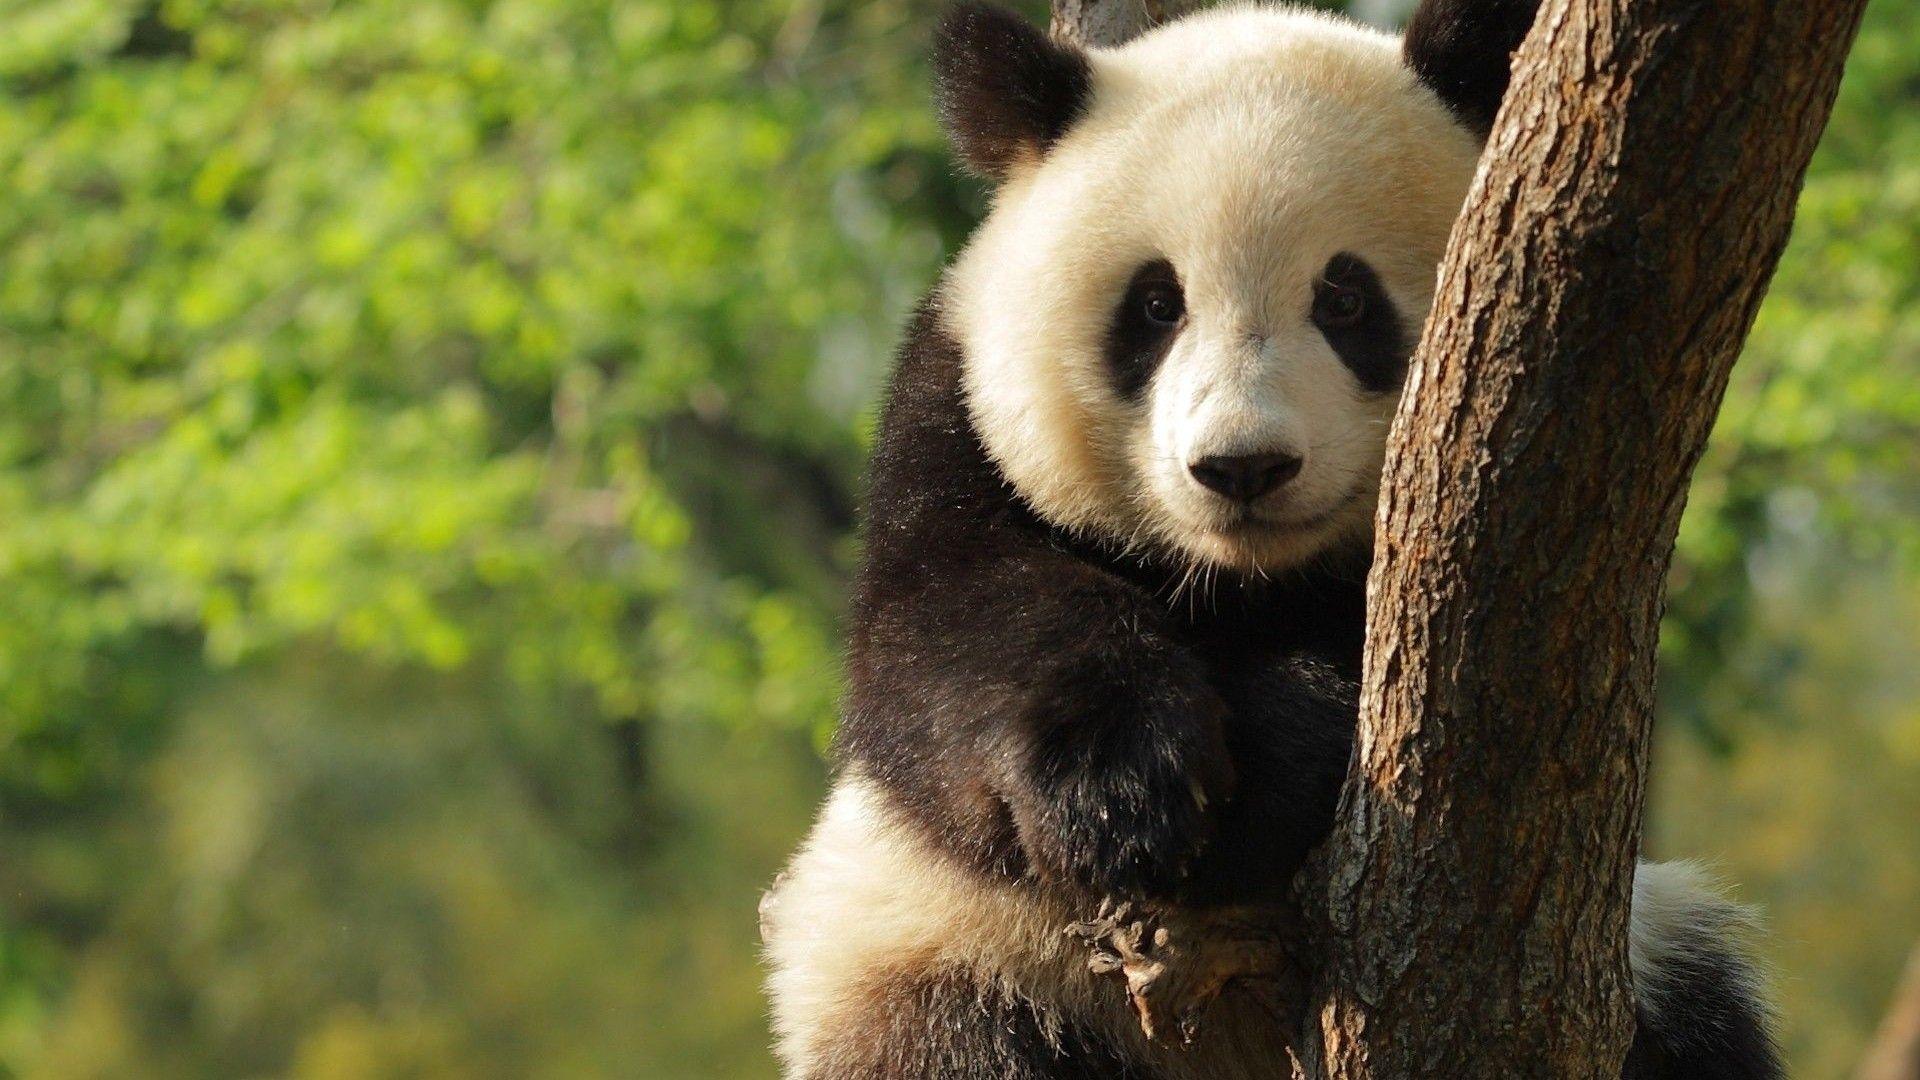 Giant Panda HD Wallpapers   Panda, Giant panda, Panda wallpapers